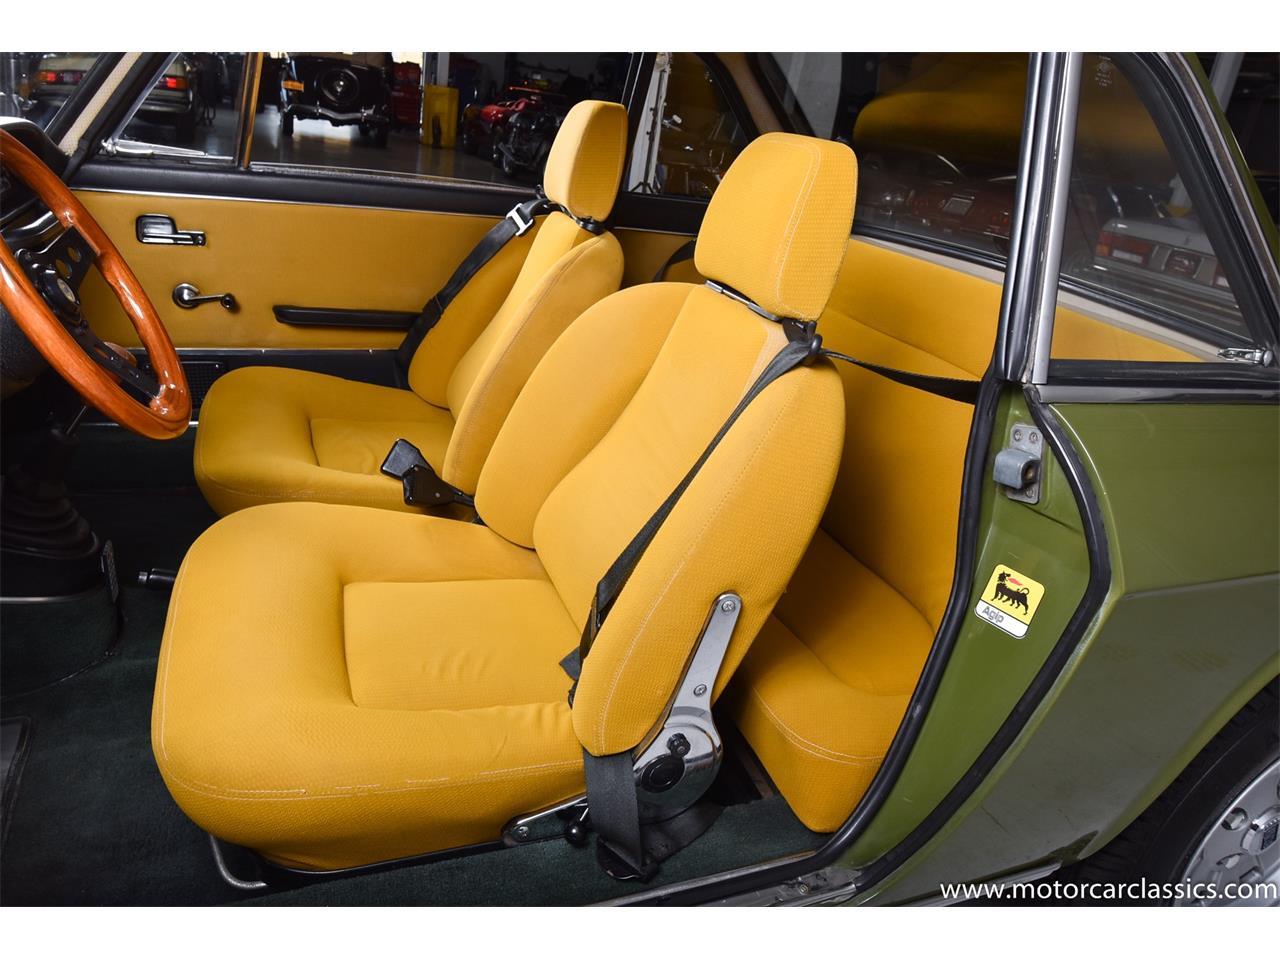 1975 Lancia Fulvia (CC-1369094) for sale in Farmingdale, New York